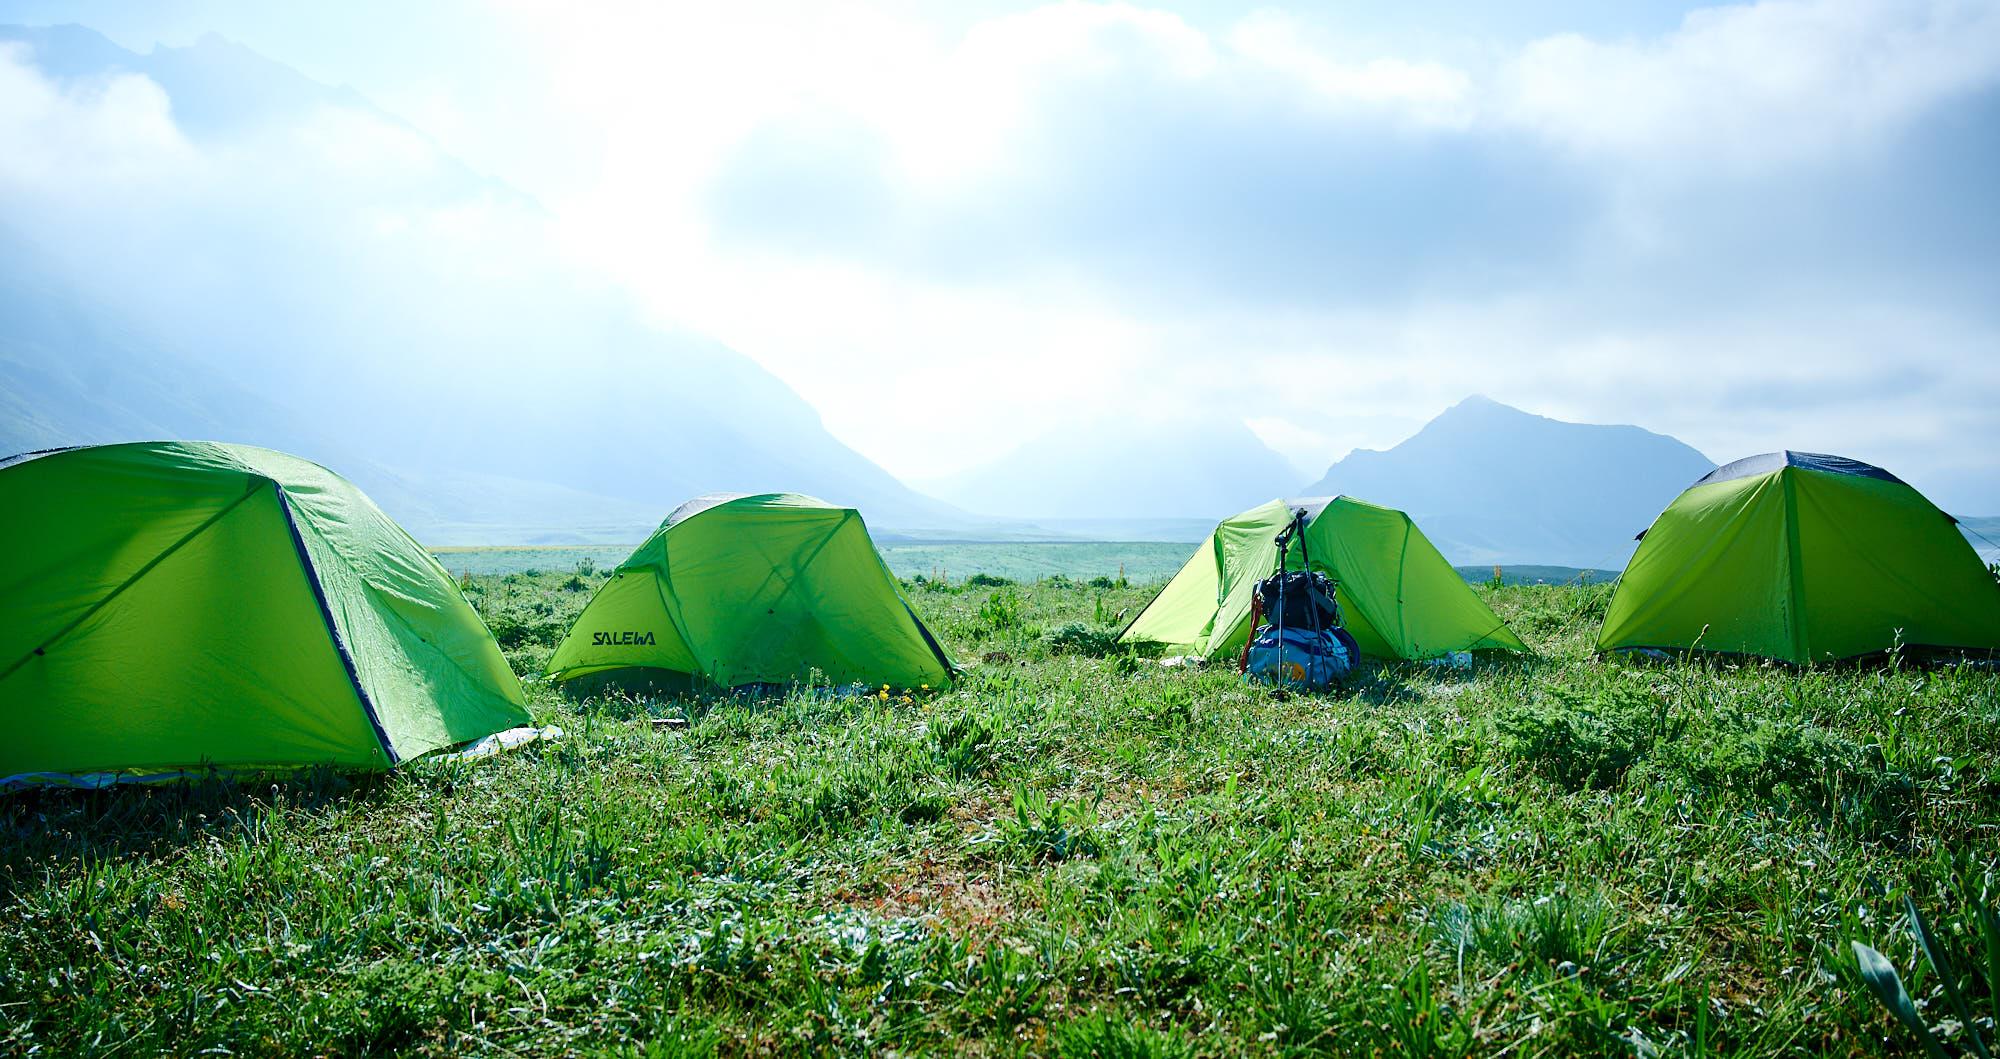 Tents in Dar valley in Iran